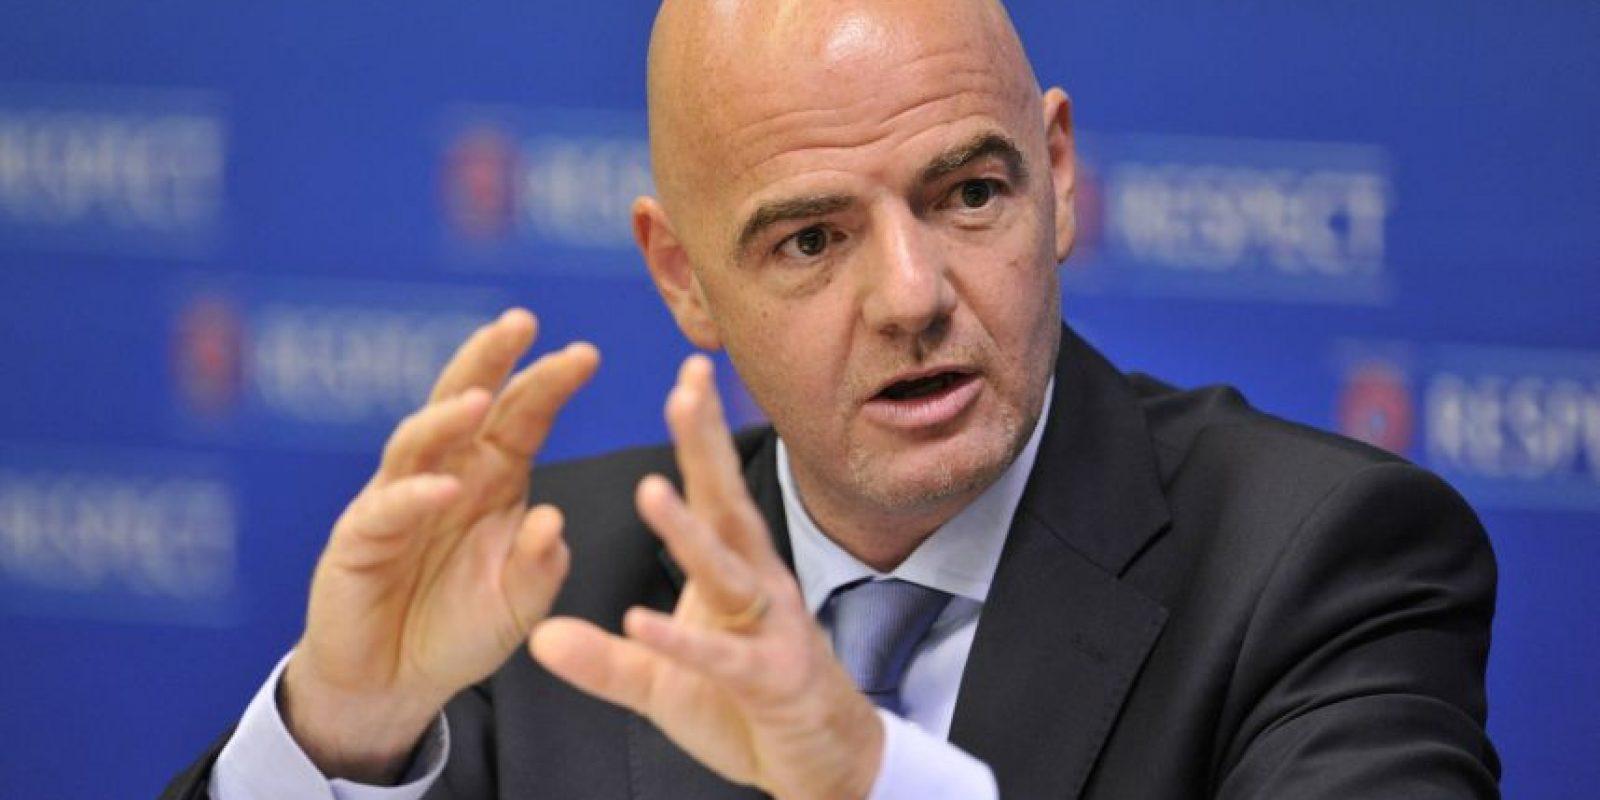 Gianni Infantino, secretario general de FIFA Foto:Getty Images. Imagen Por: